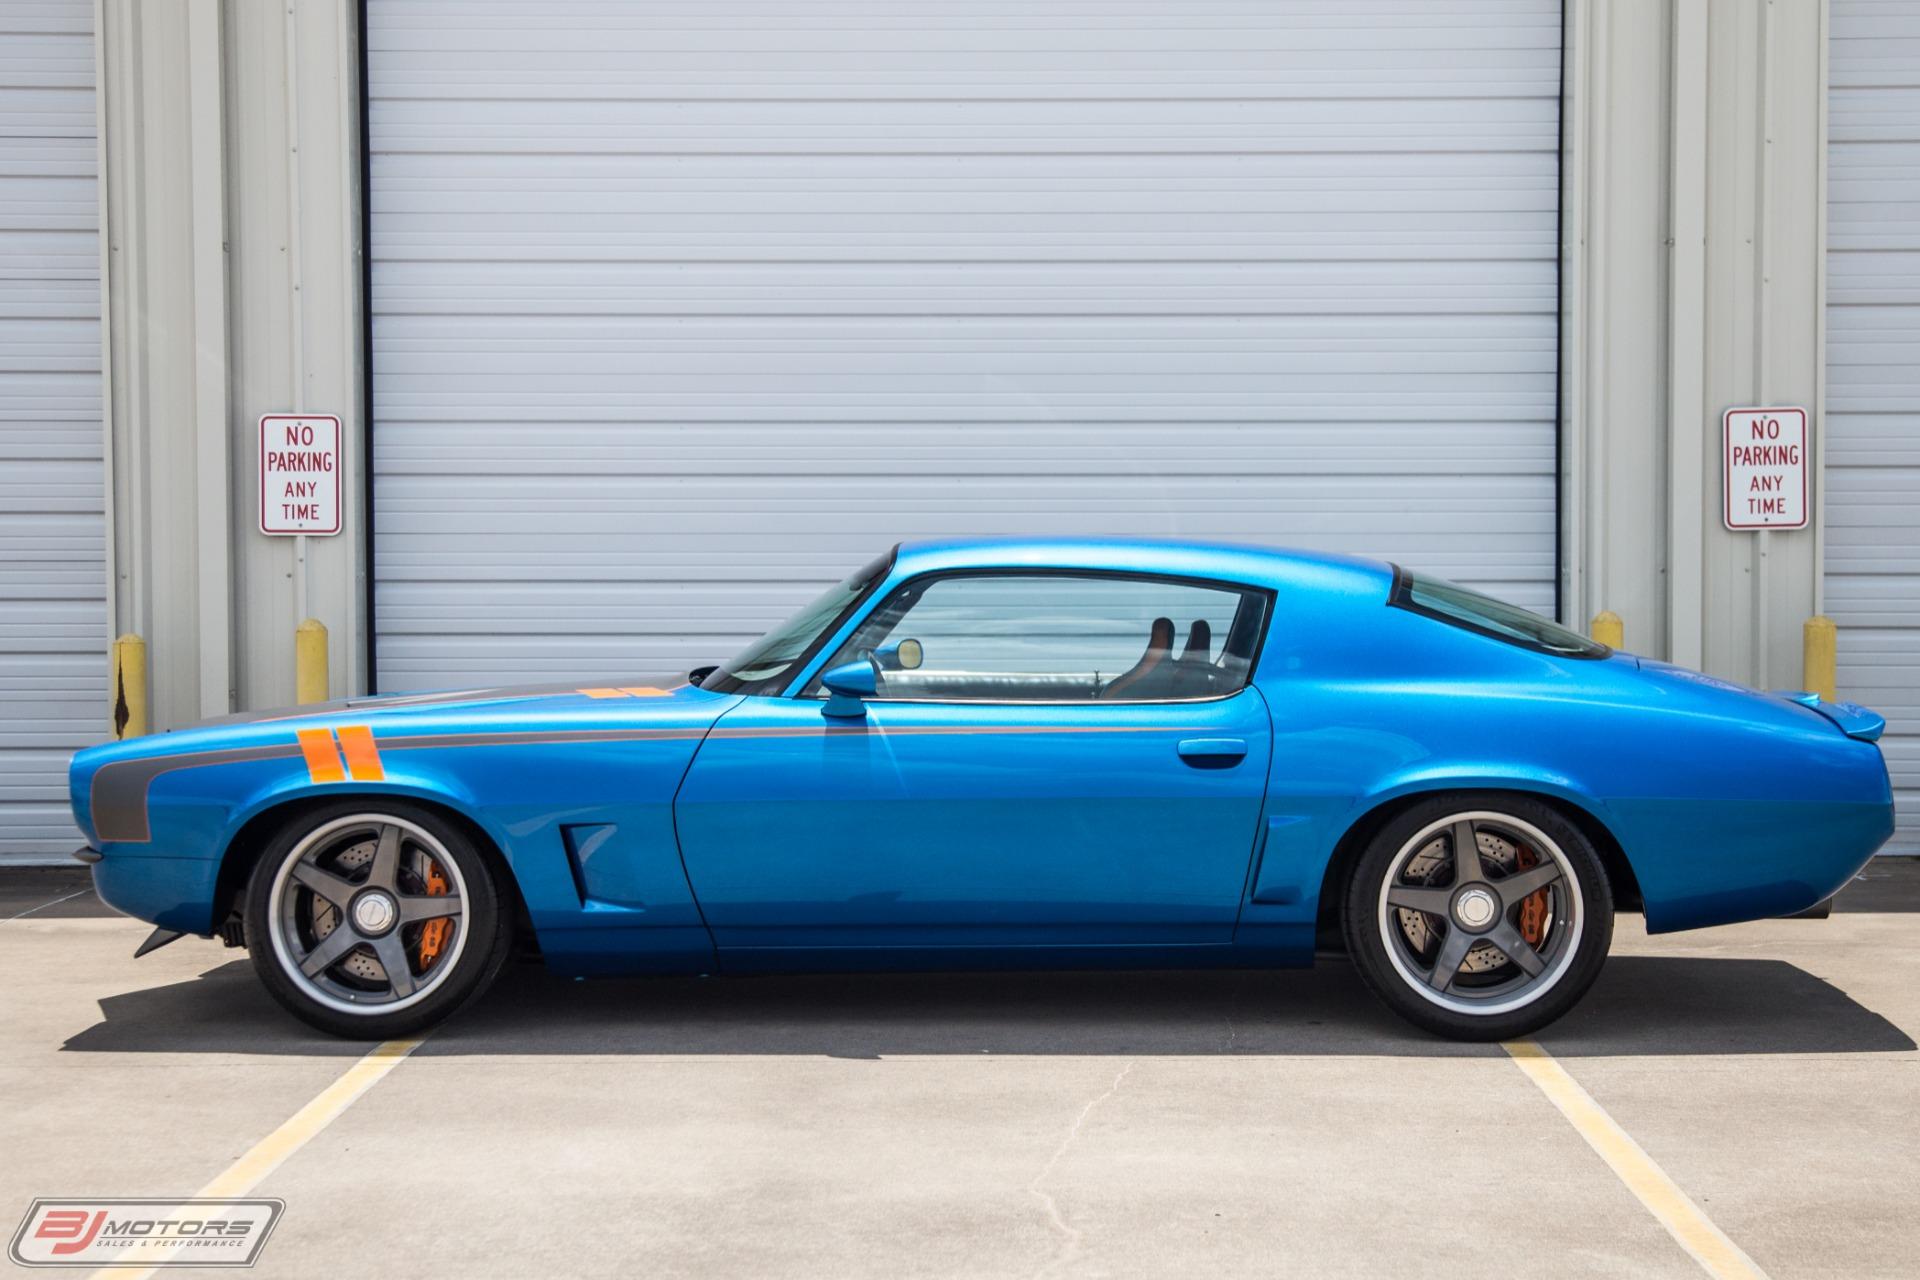 Used-1971-Chevrolet-Brute-Force-Camaro-Multiple-Show-Winner